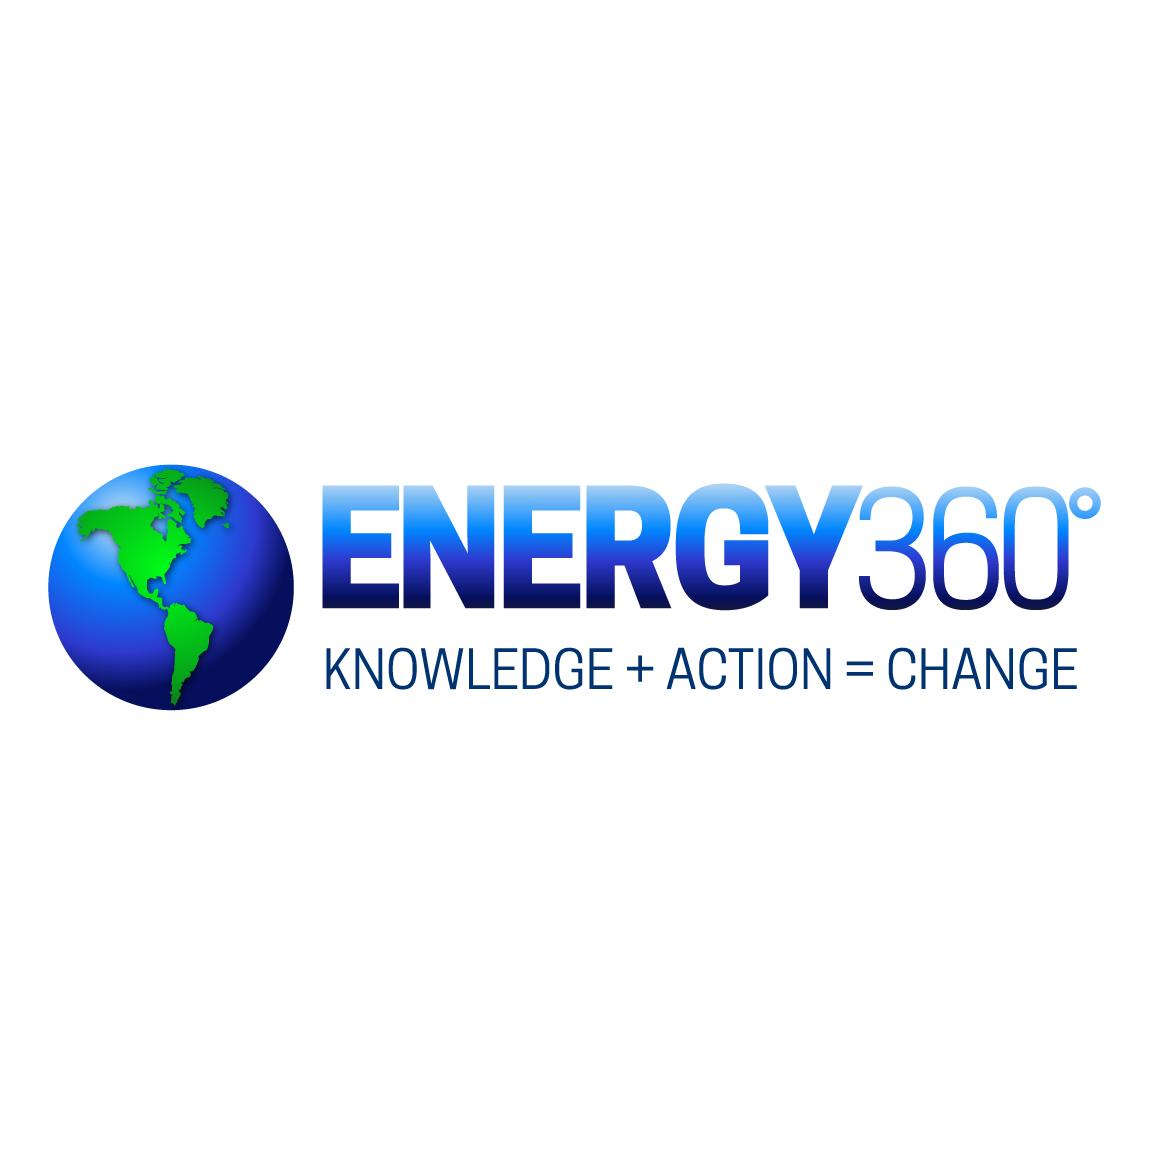 Energy 360